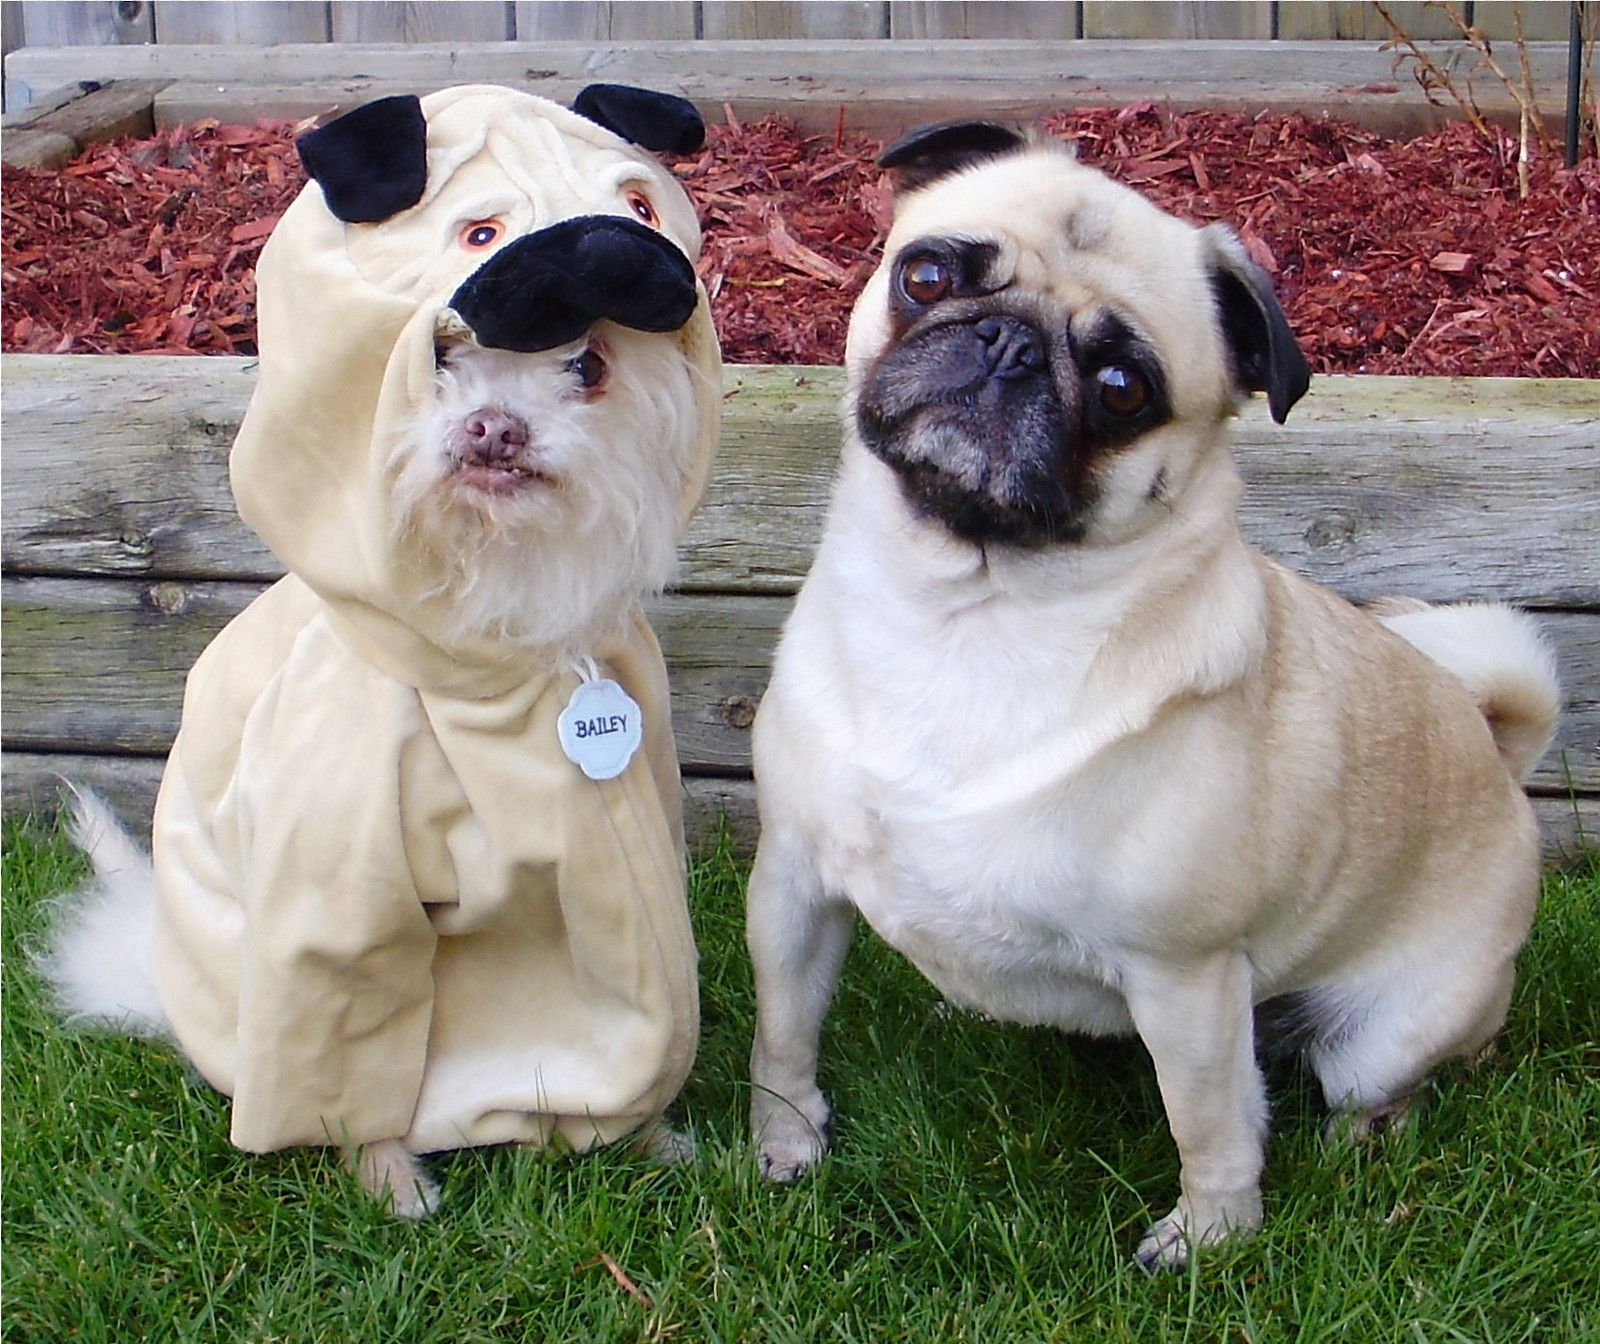 Dress up your pet day - Dress Up Your Pet Day Is Today Here Are 28 Pet Costume Ideas Pet